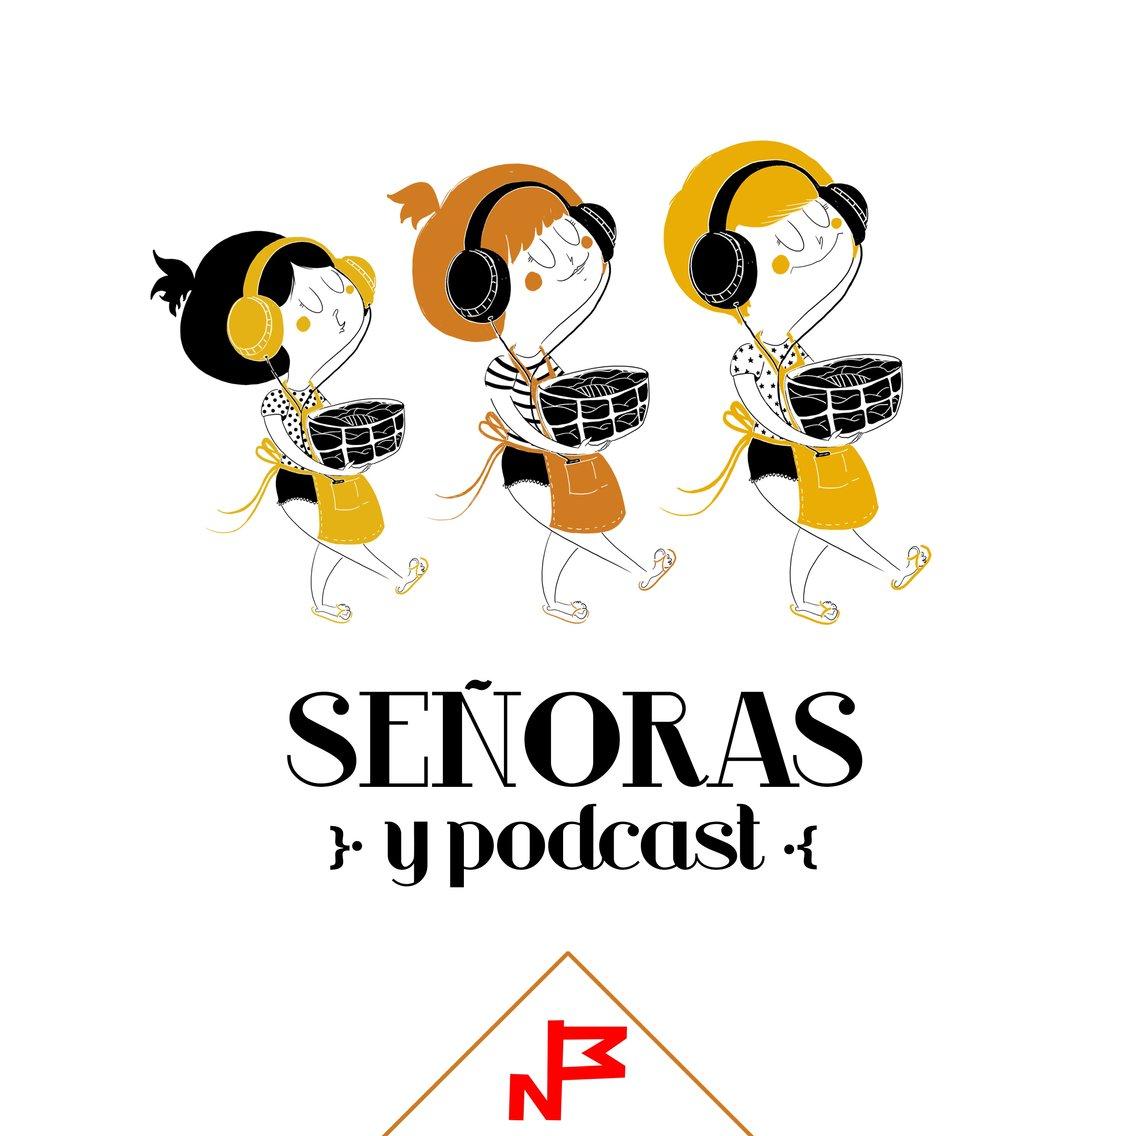 Señoras y Podcast - Cover Image